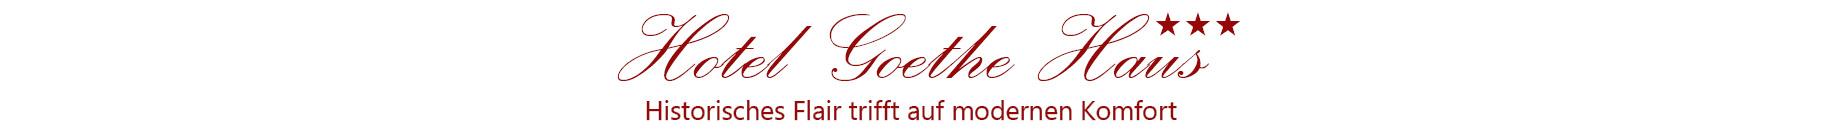 Hotel Goethe Haus Logo